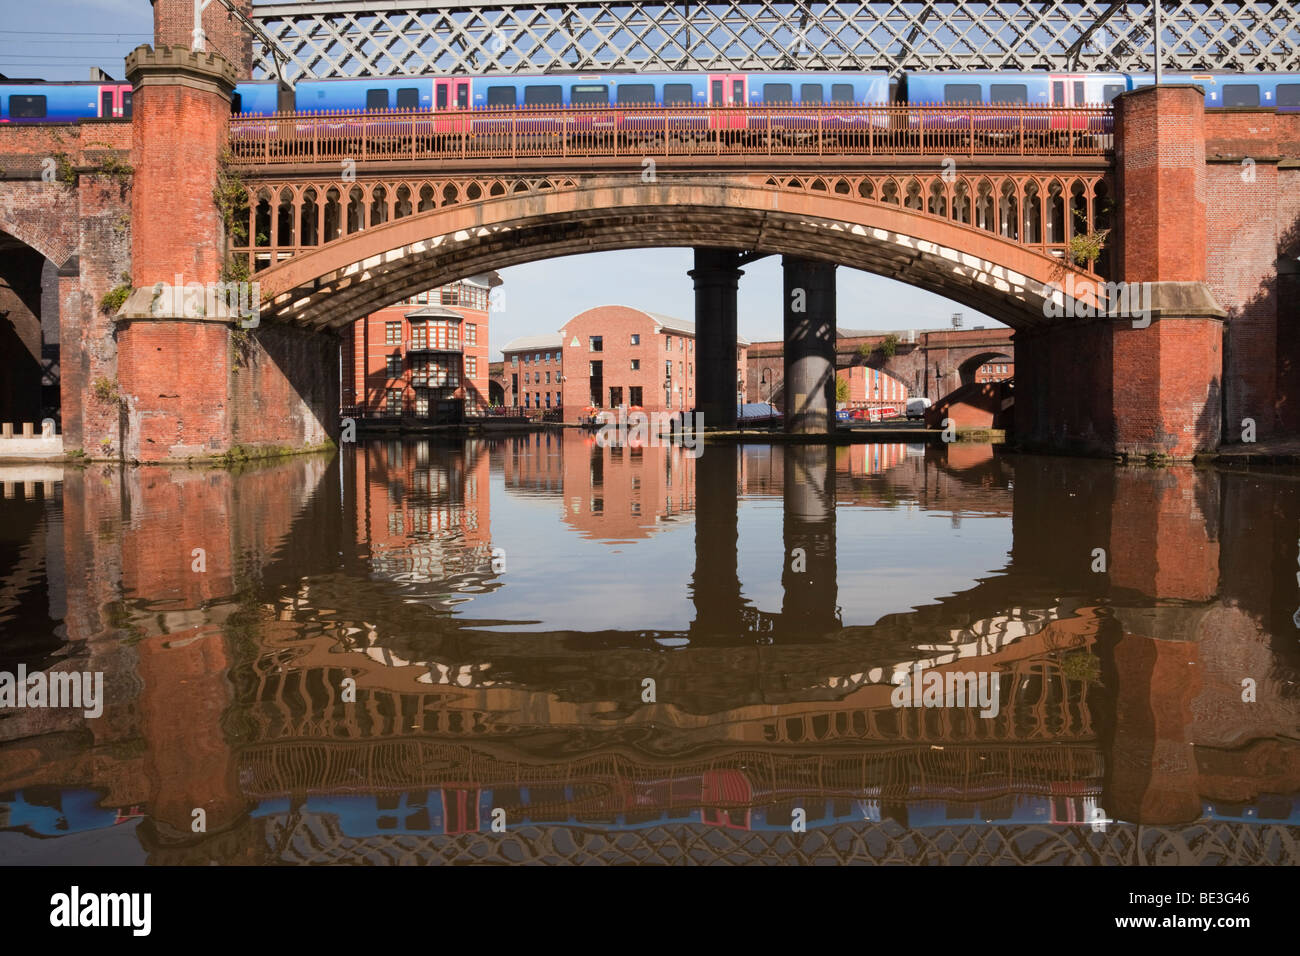 Bahnübergang viktorianischen Eisenbahnviadukt Brücke über Bridgewater Canal in Castlefield Urban Heritage Park Conservation Area. Manchester, England, UK. Stockfoto